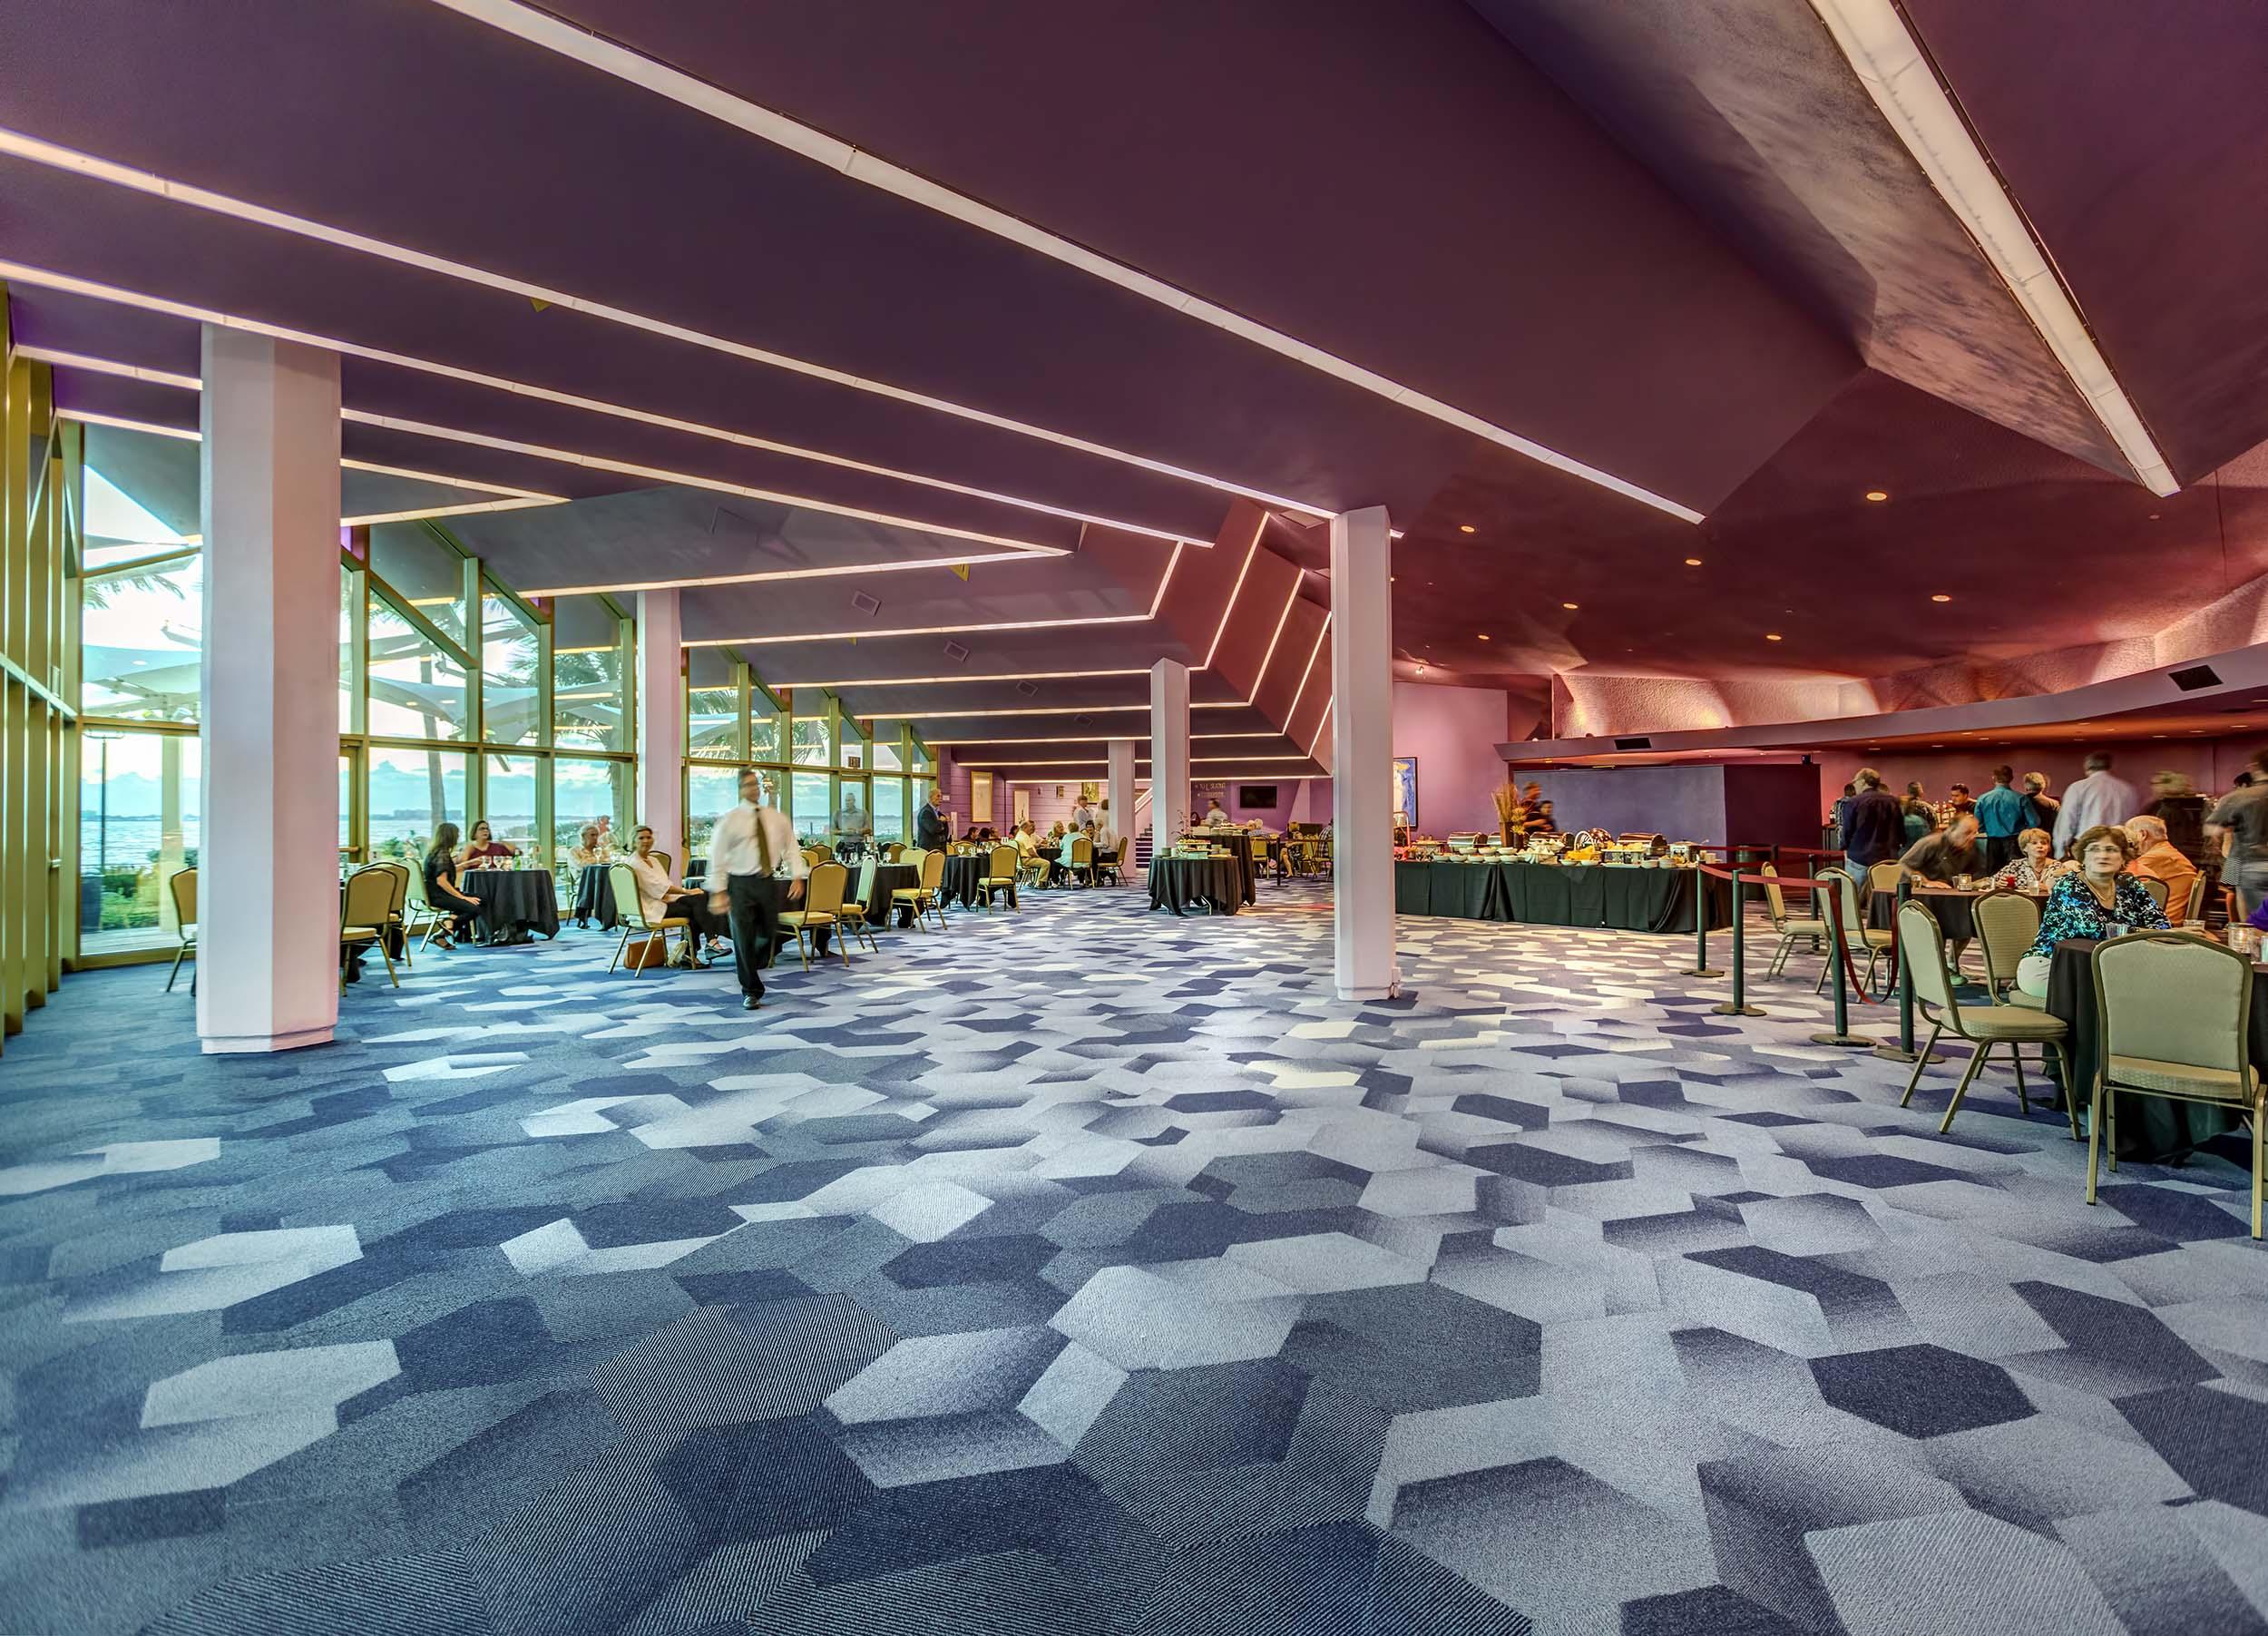 Solstice_Architects_Van_Wezel_11.jpg